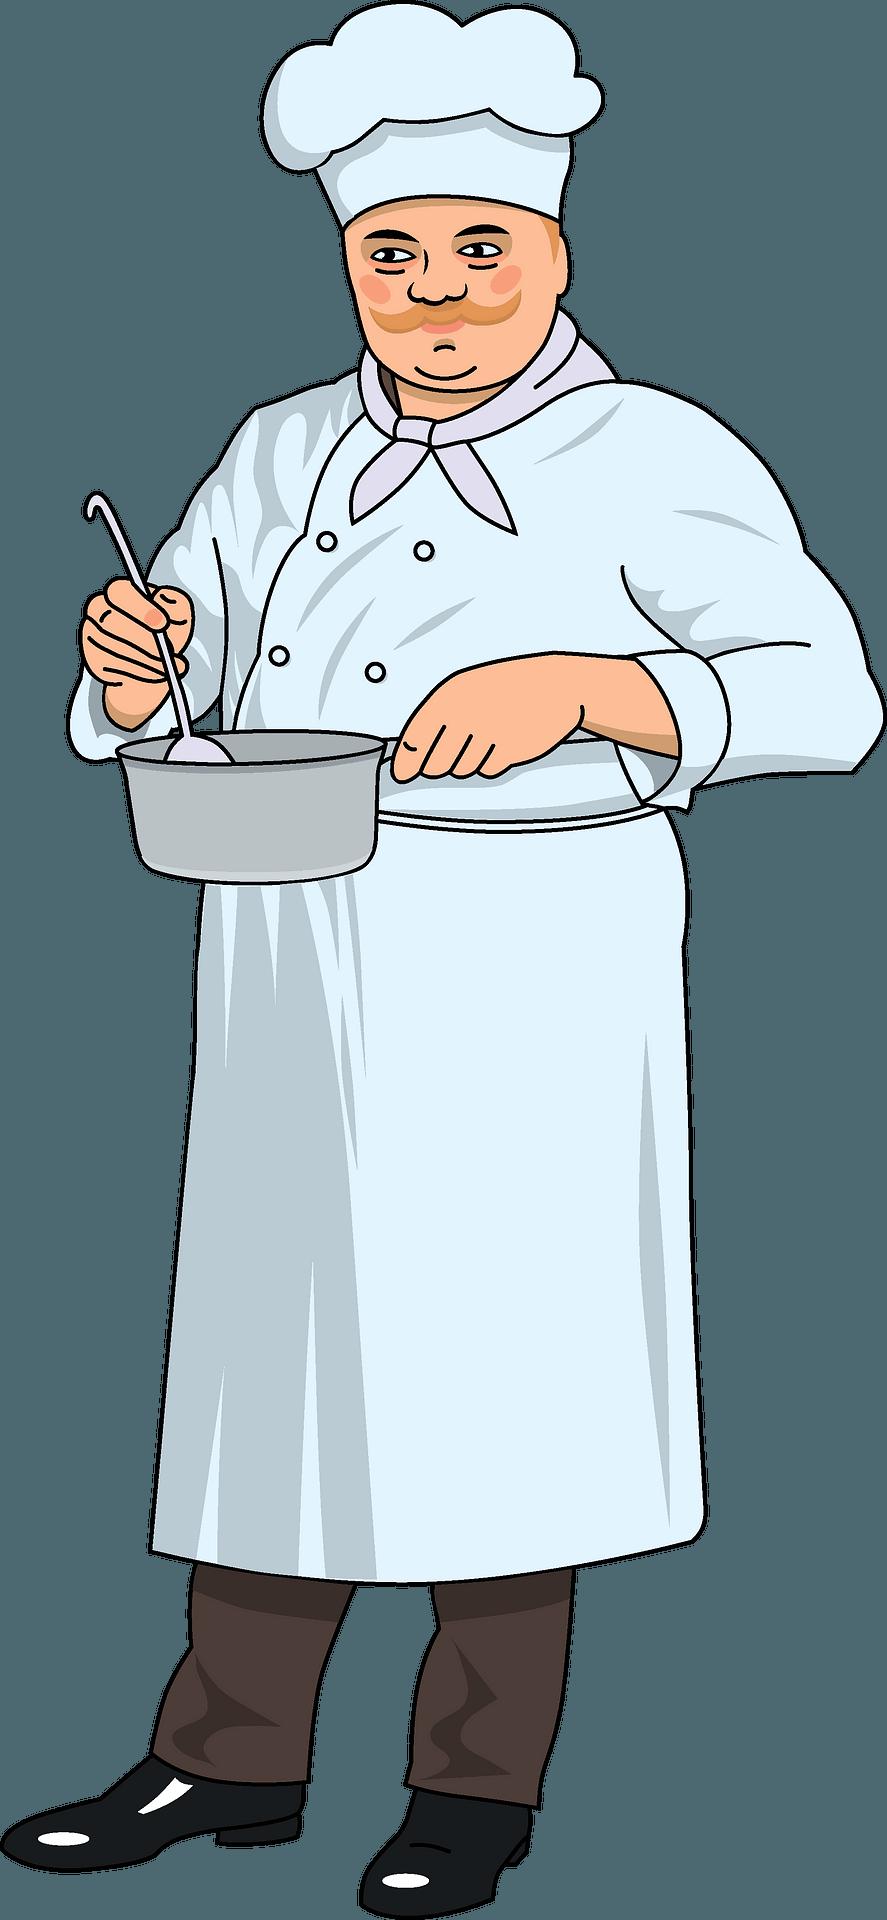 Happy Chef Cartoon Mascot Clipart Royalty Free Vector Image